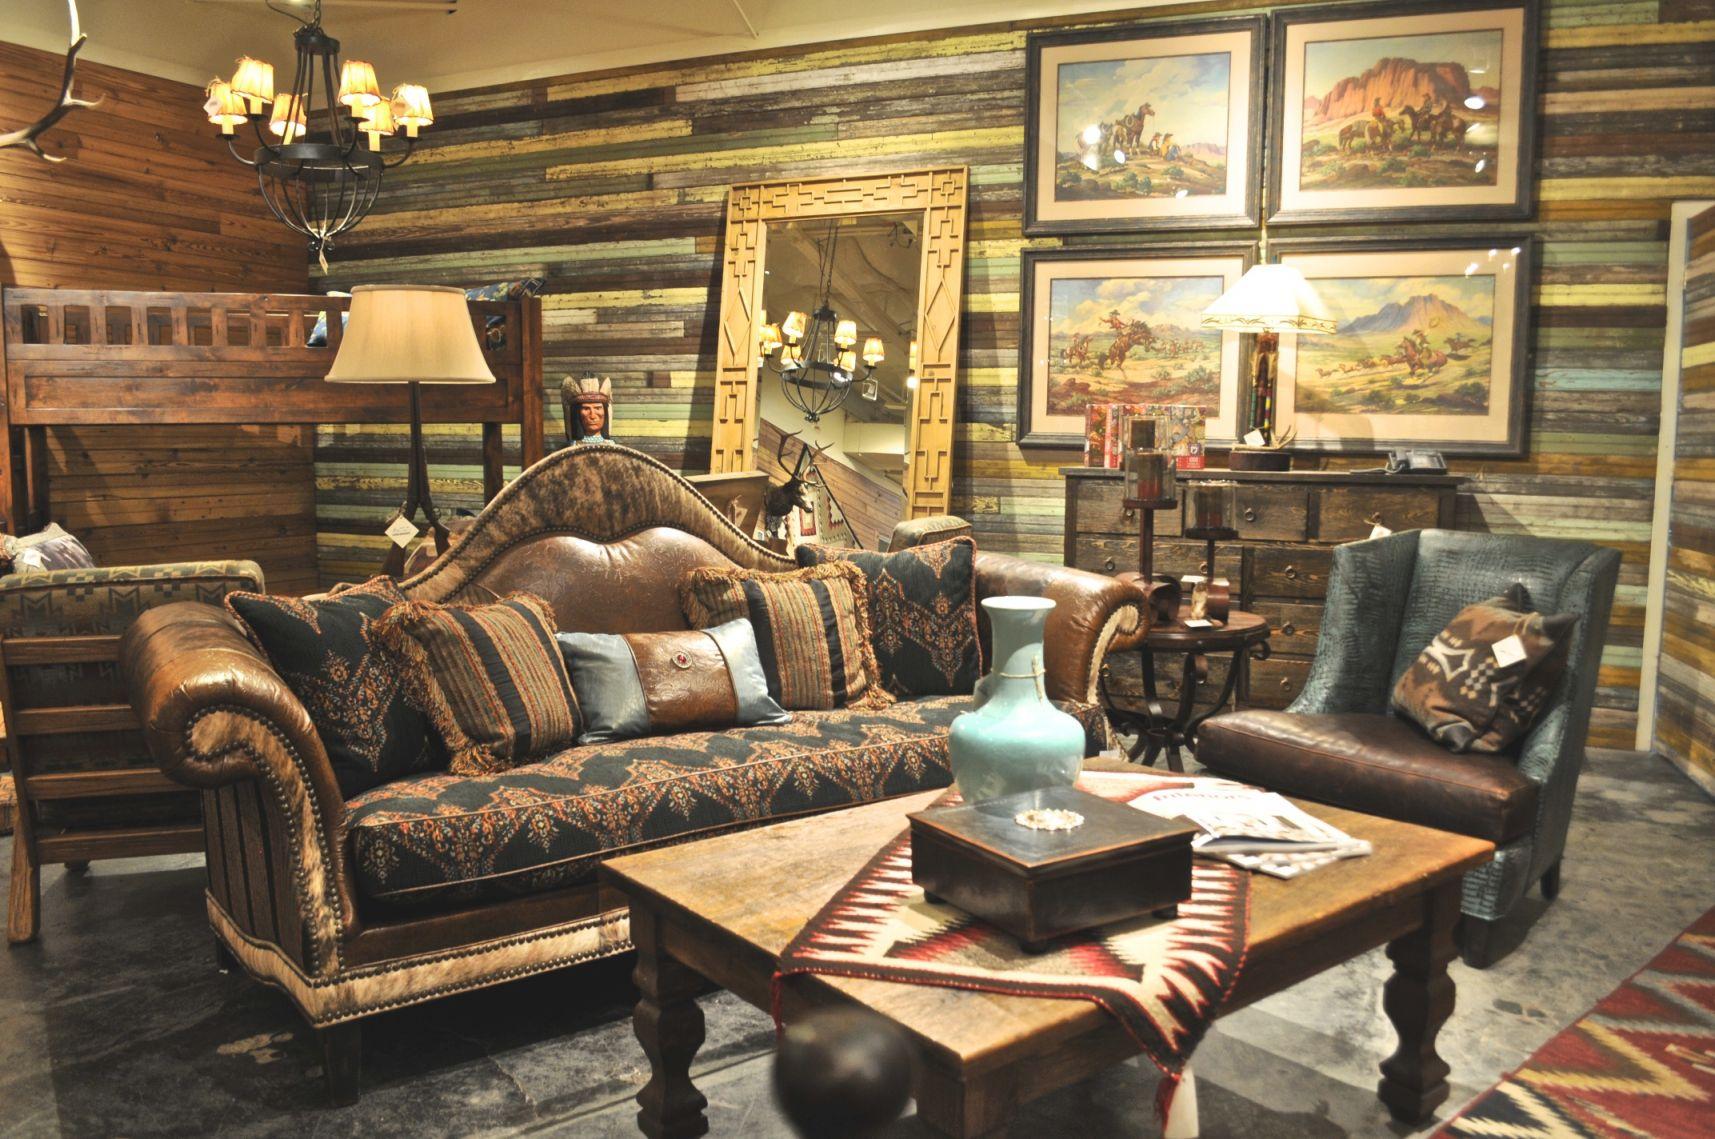 Rustic Living Room Furniture At Anteks Furniture In Dallas in Rustic Living Room Furniture